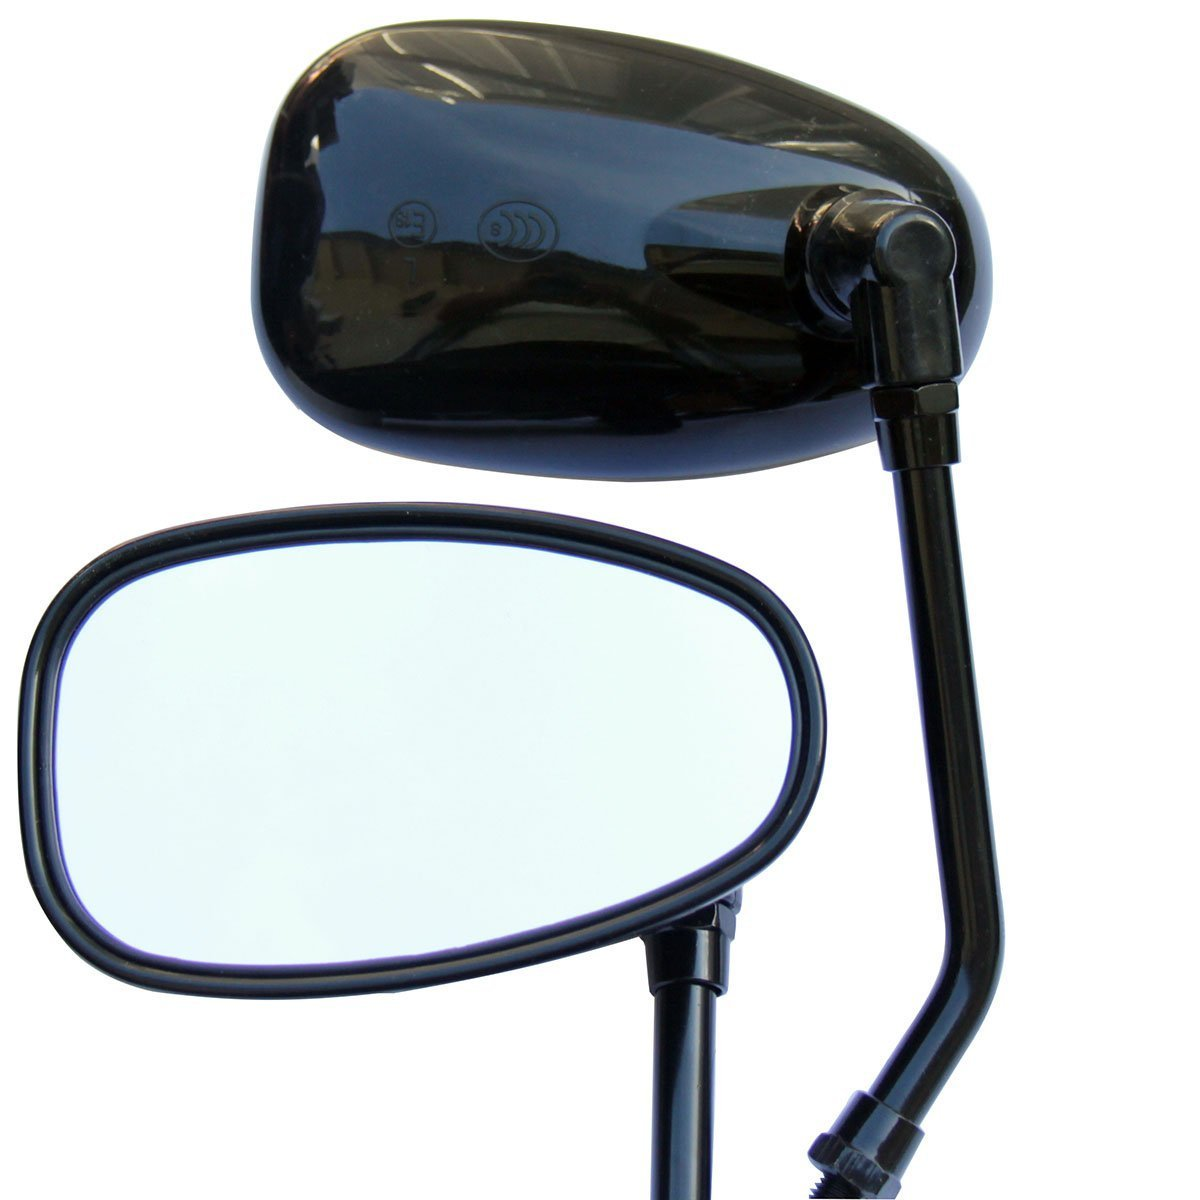 Black Oval Rear View Mirrors for 2005 Yamaha V Star 650 XVS650 Custom